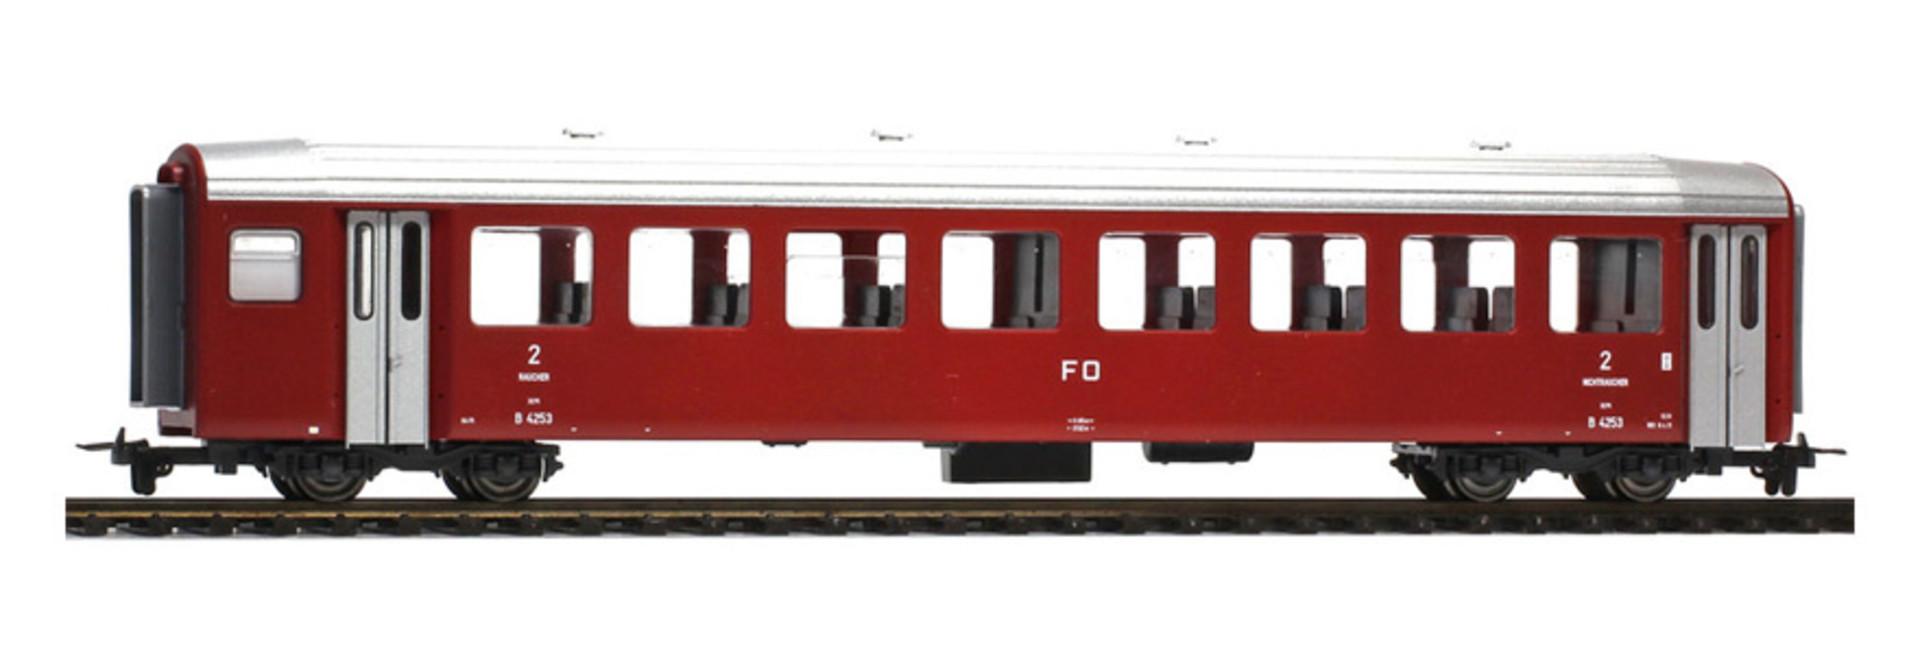 3267203 FO B 4253 Pendelzugwagen dunkelrot